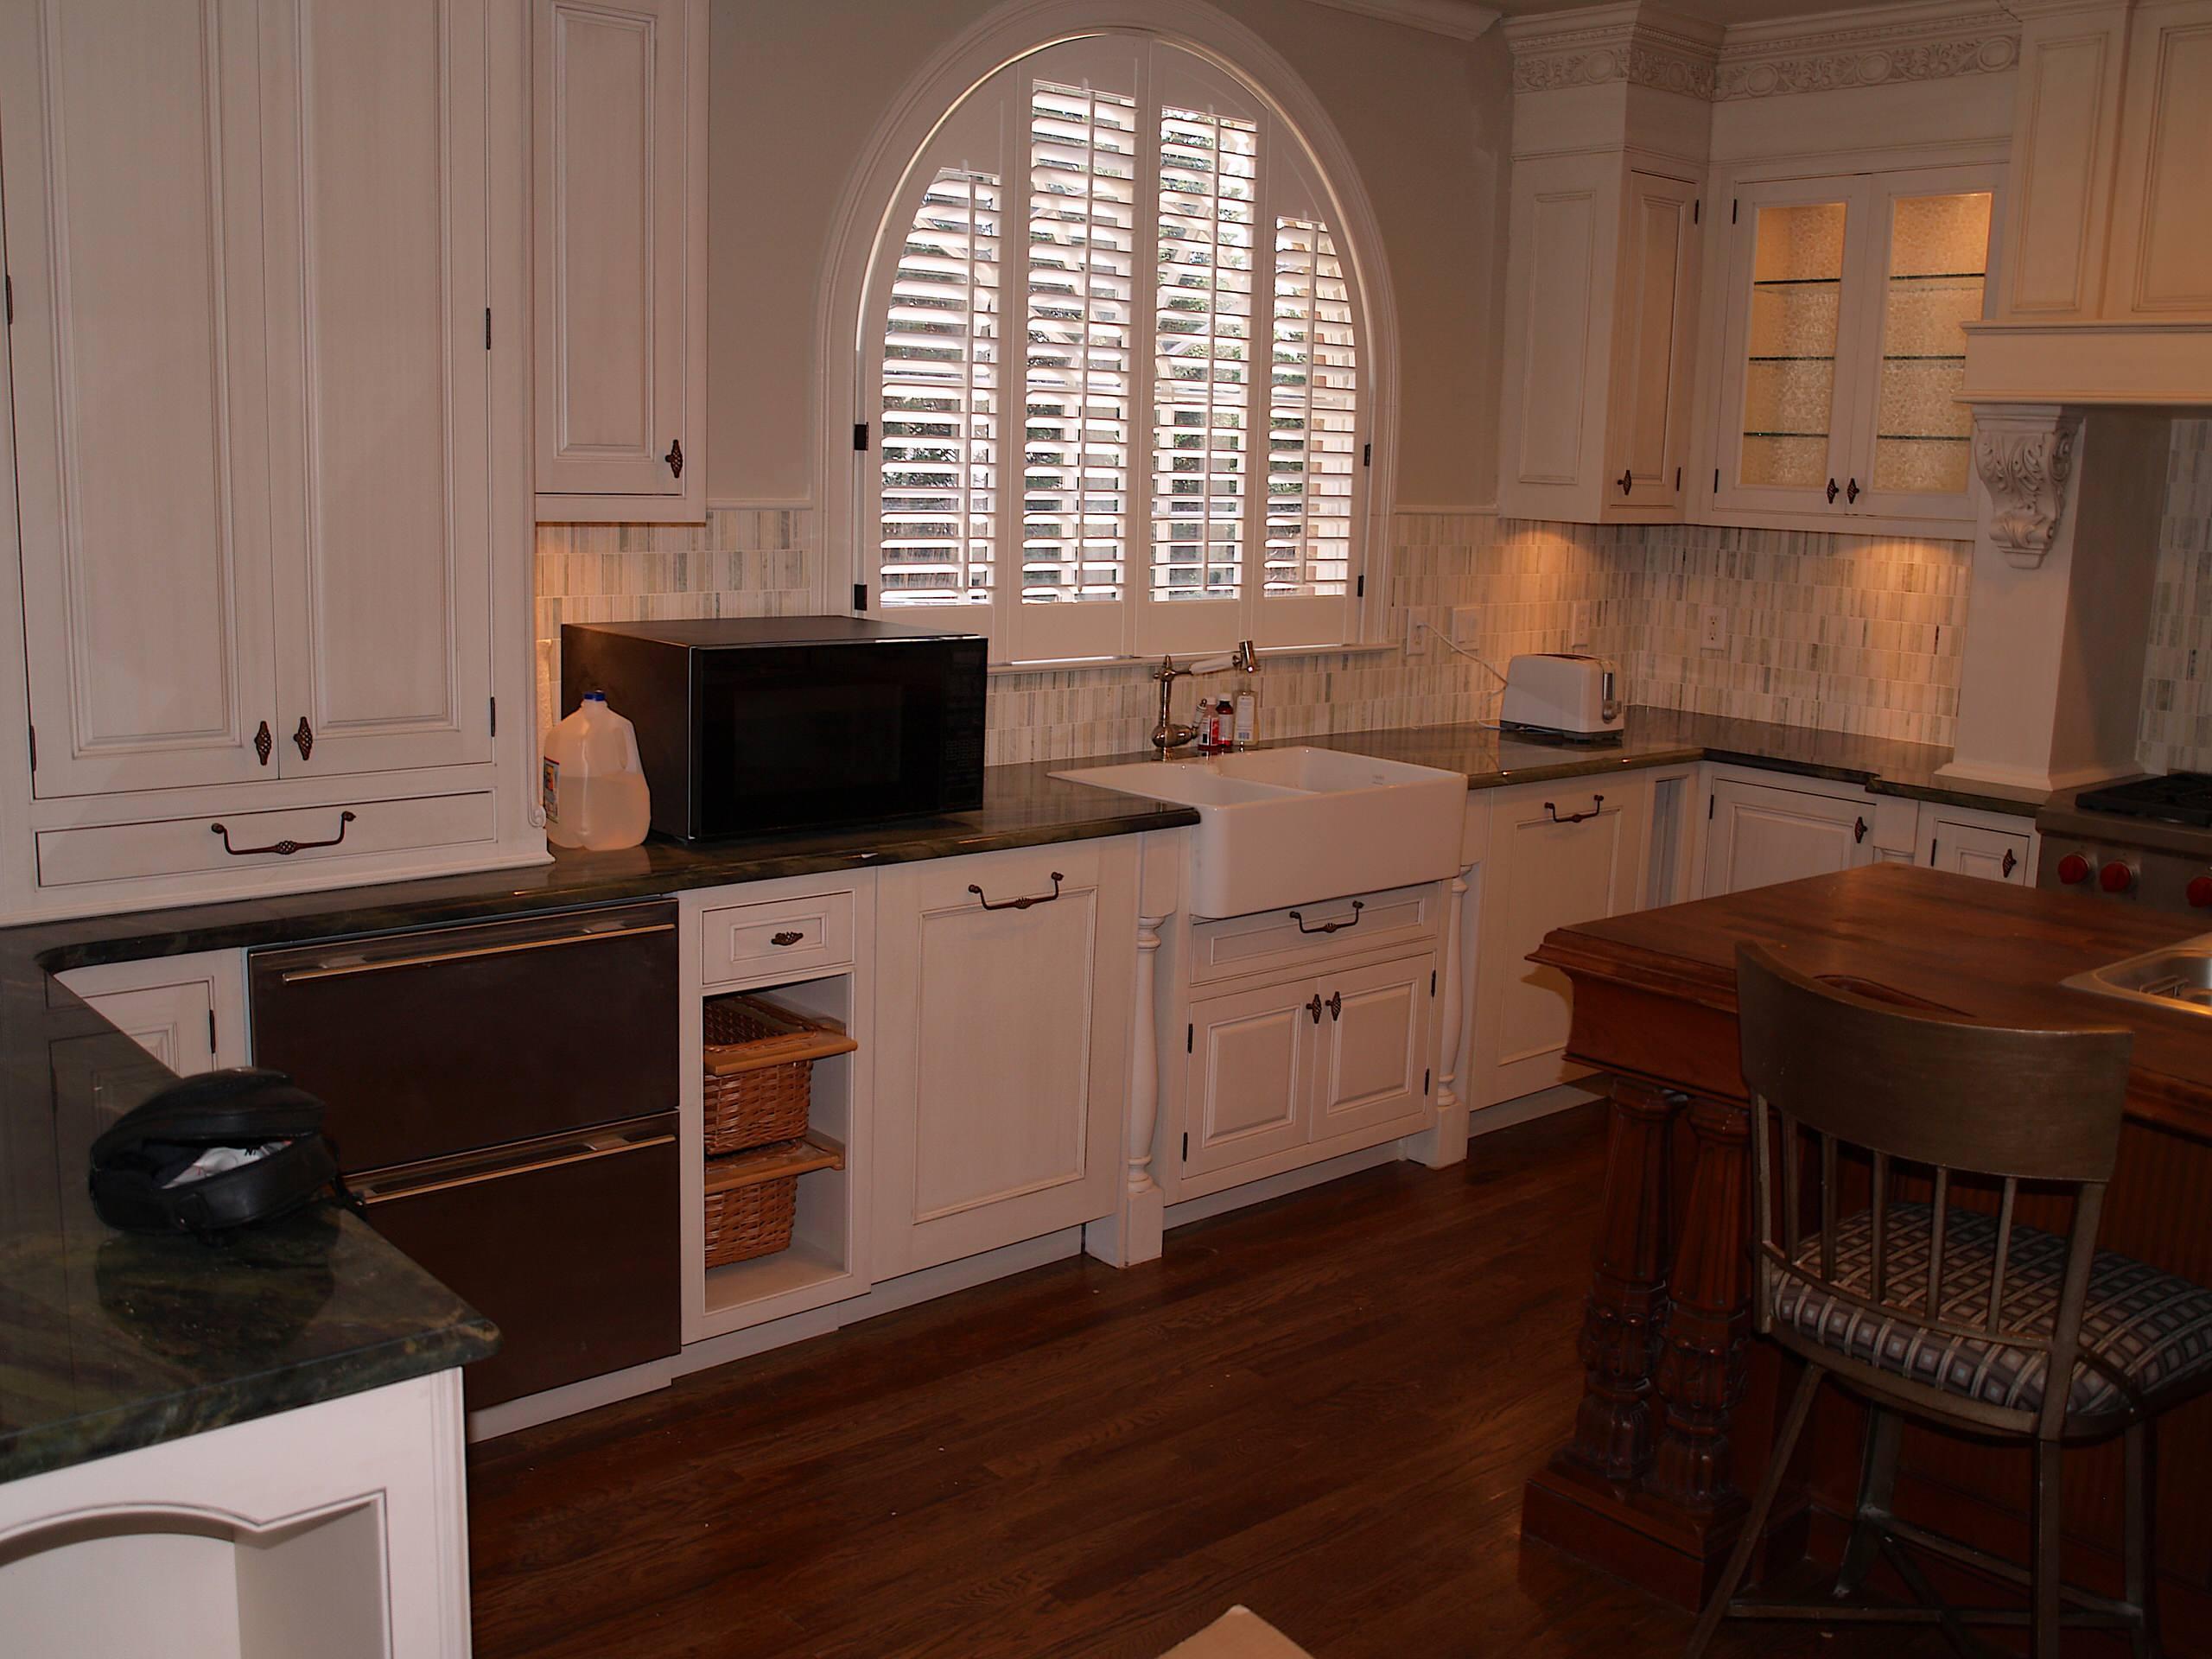 Cabinet Refinishing.Lite off white faux.Custom sink.